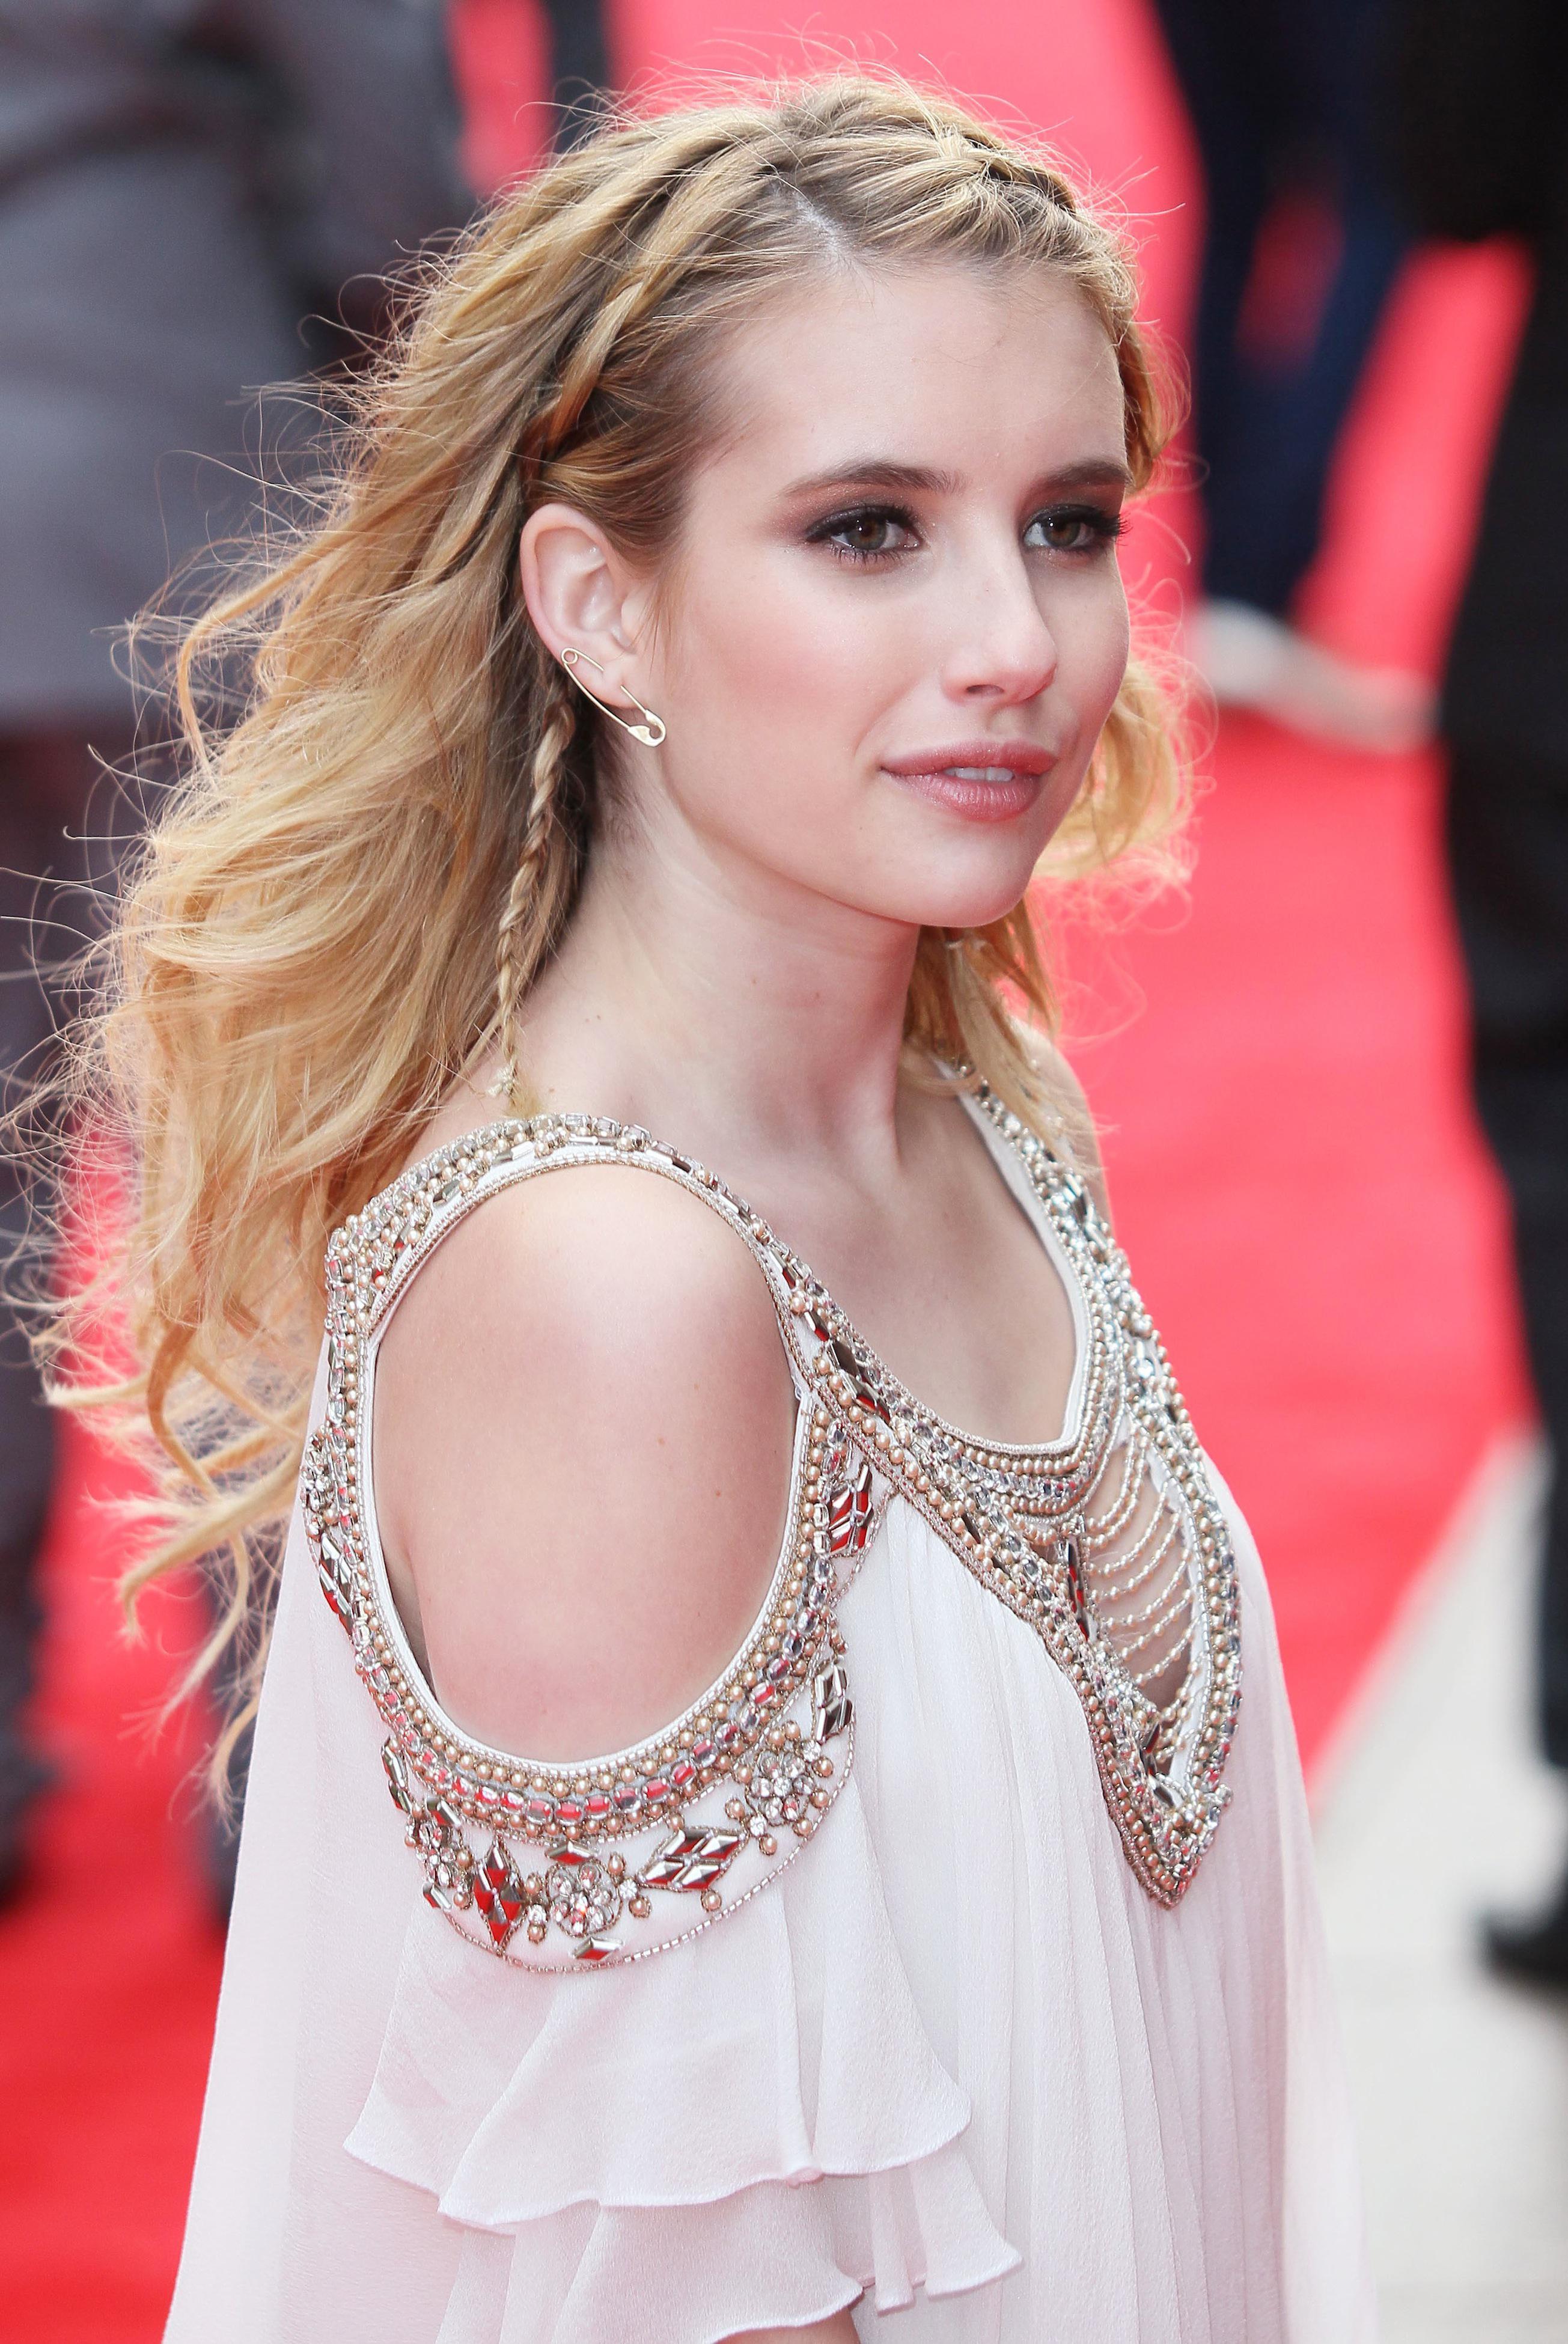 Emma roberts palo alto 2014 - 1 1